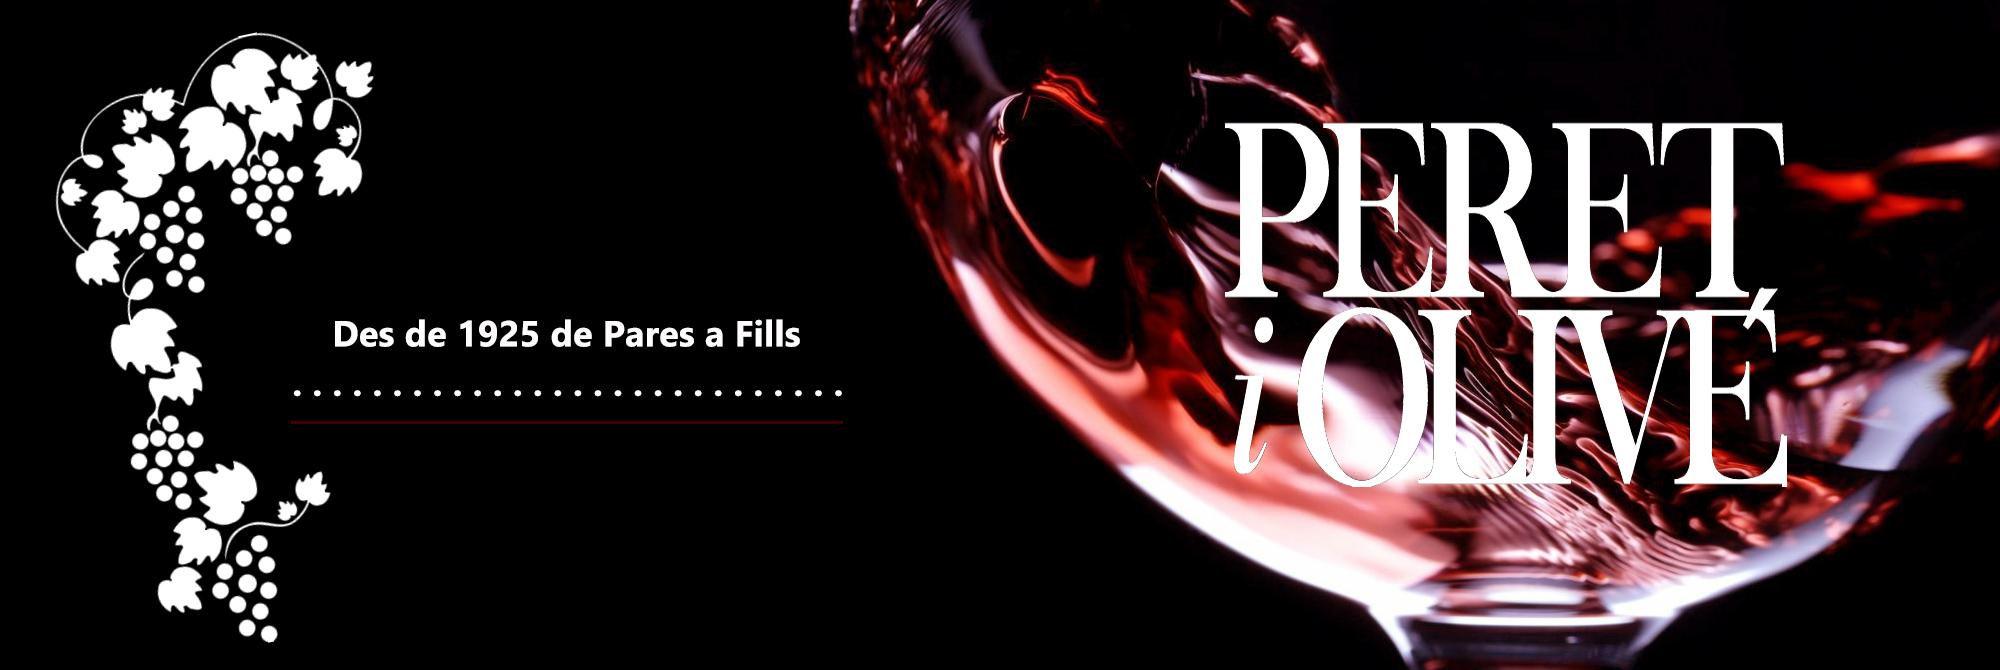 distribuciones vinos cavas cornella baix llobregat, mayorista vino cornella baix llobregat,